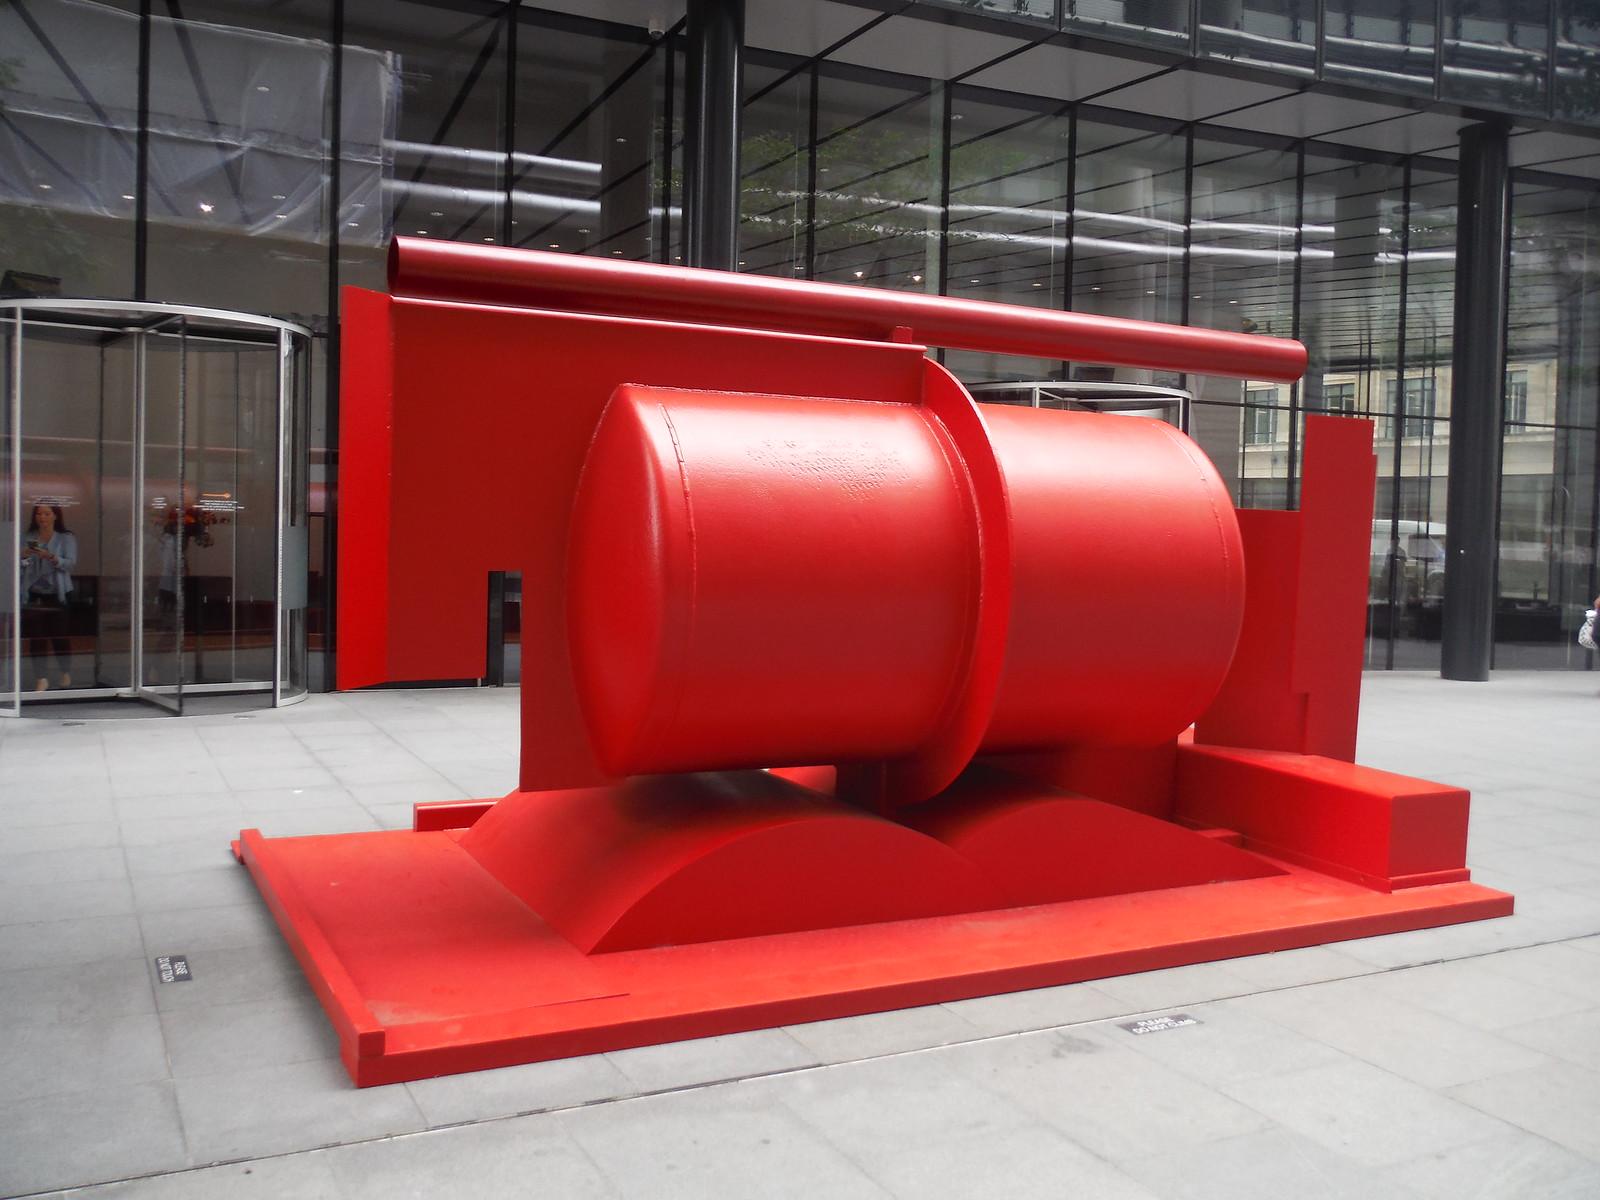 Anthony Caro - Aurora SWC Walk Short 24 - Sculpture in the City